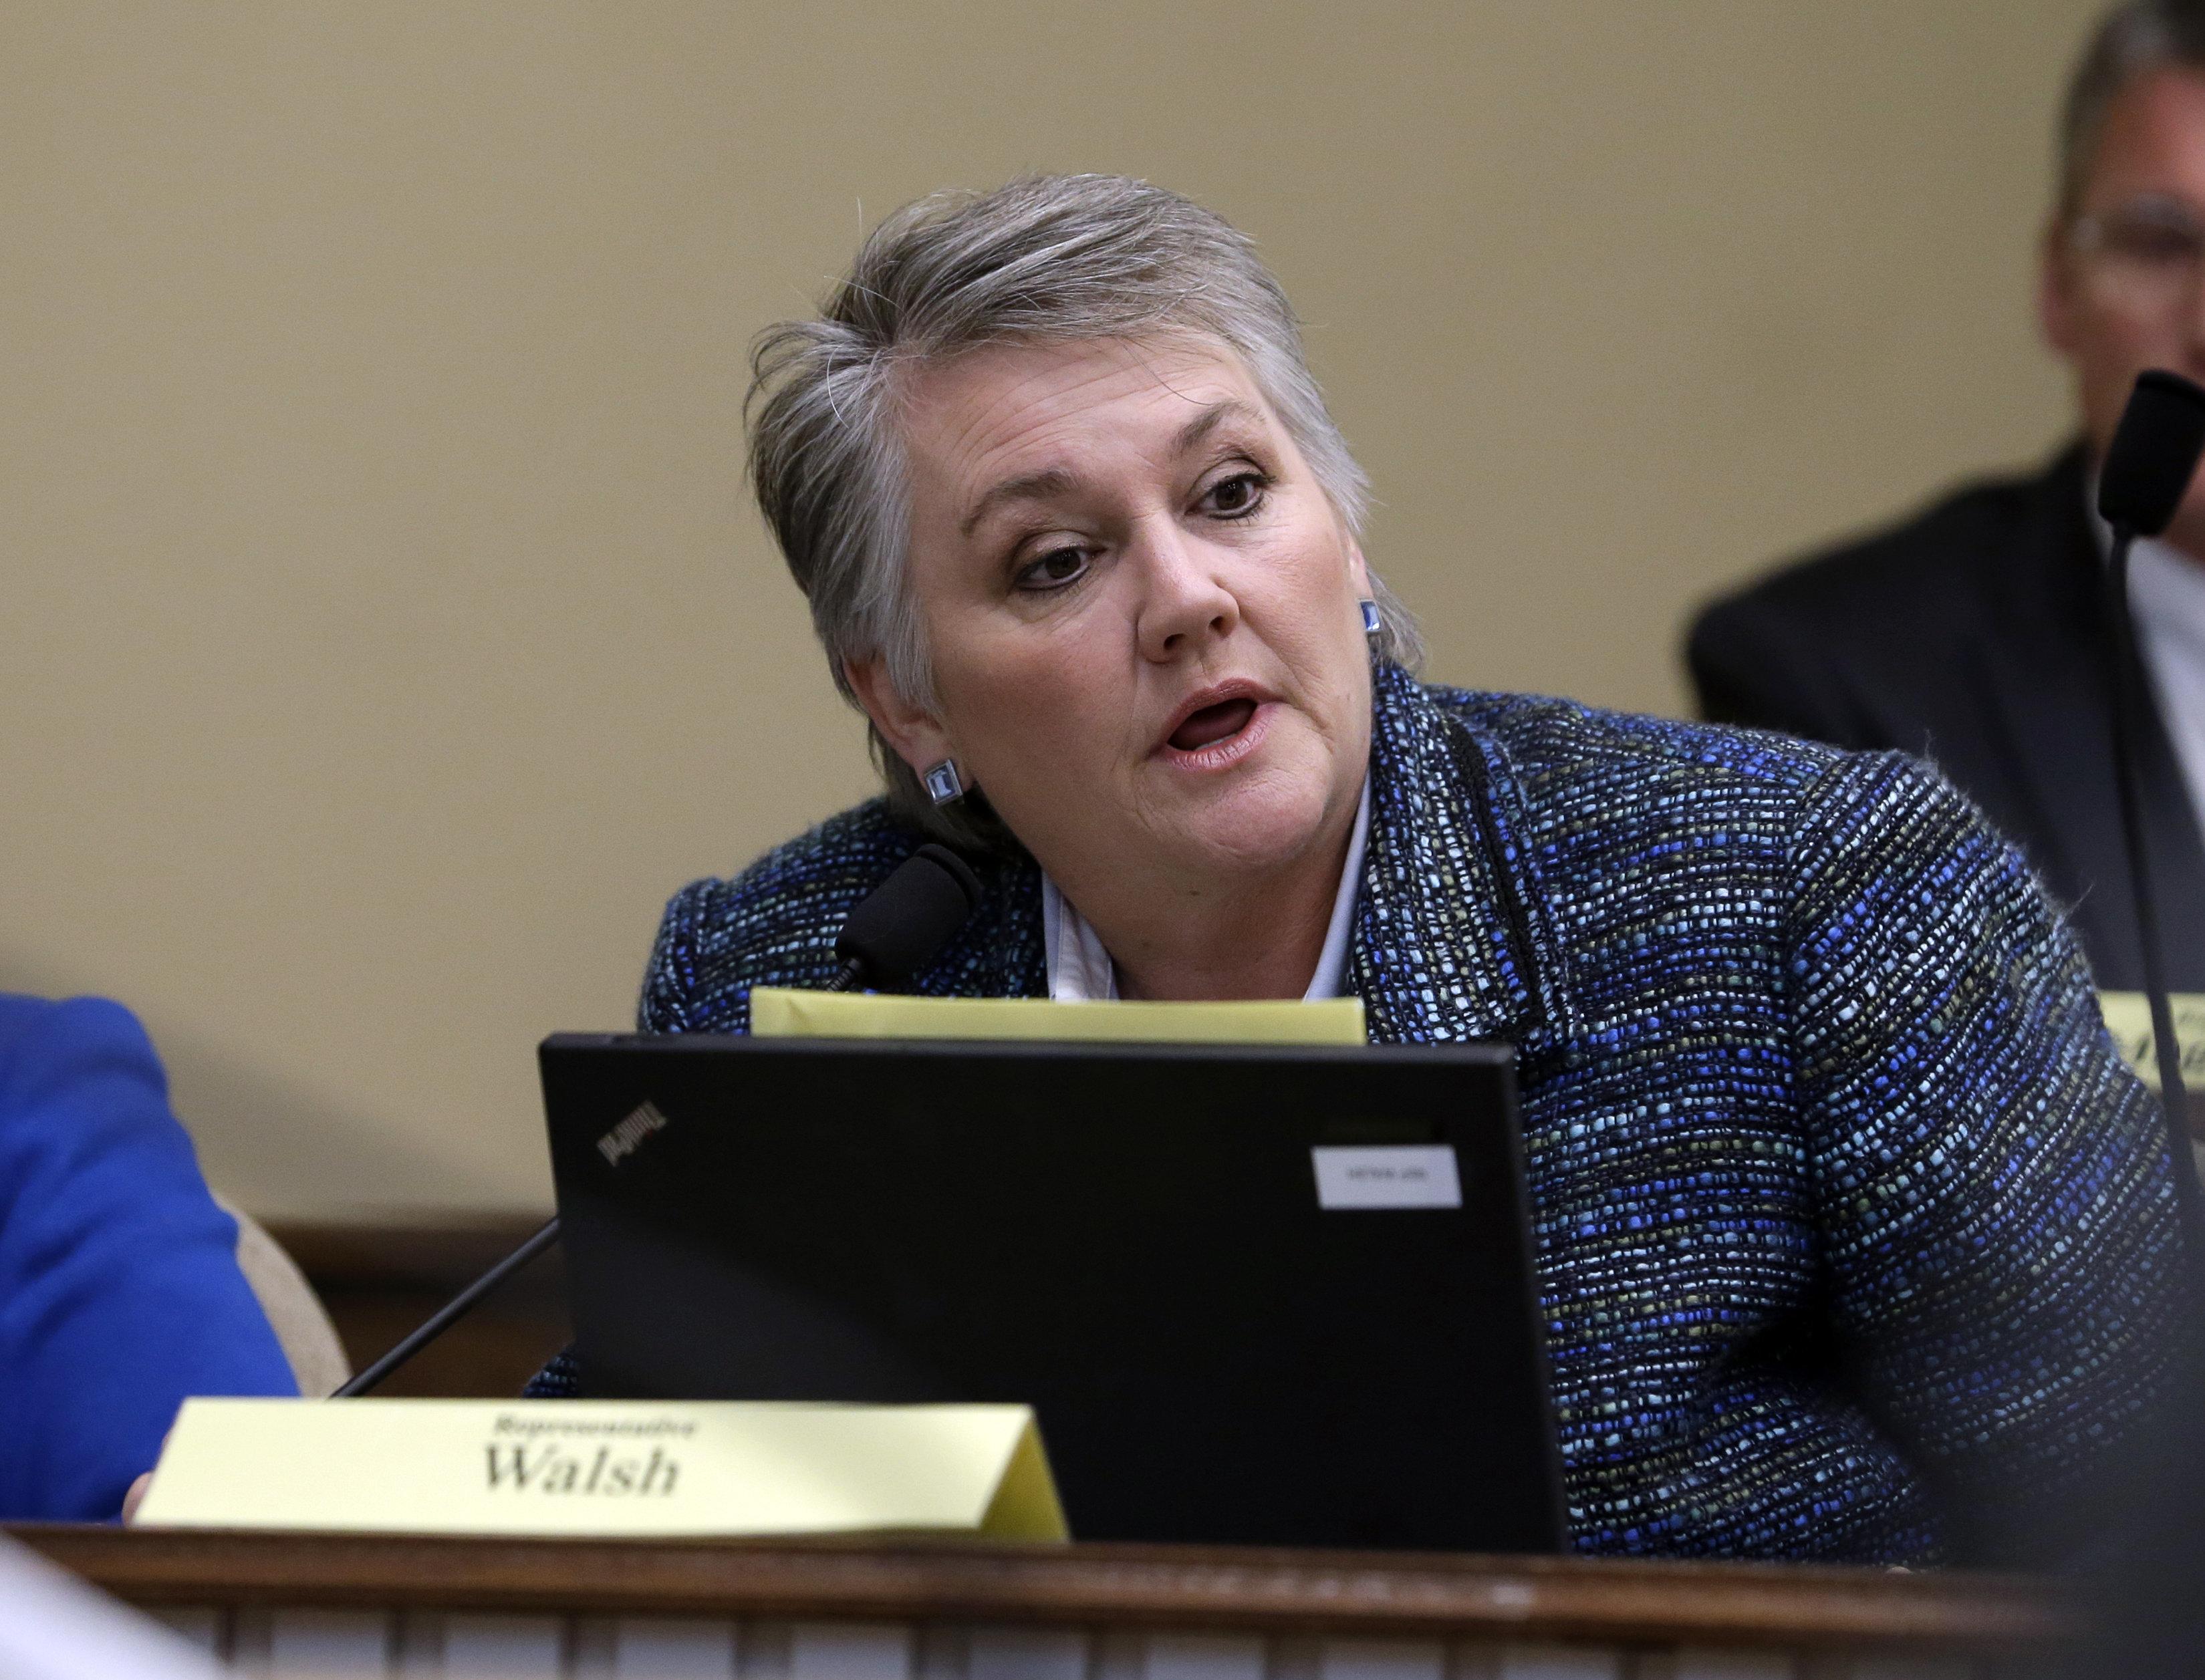 Washington GOP Senator Blasted For Saying Some Nurses 'Play Cards' During Work